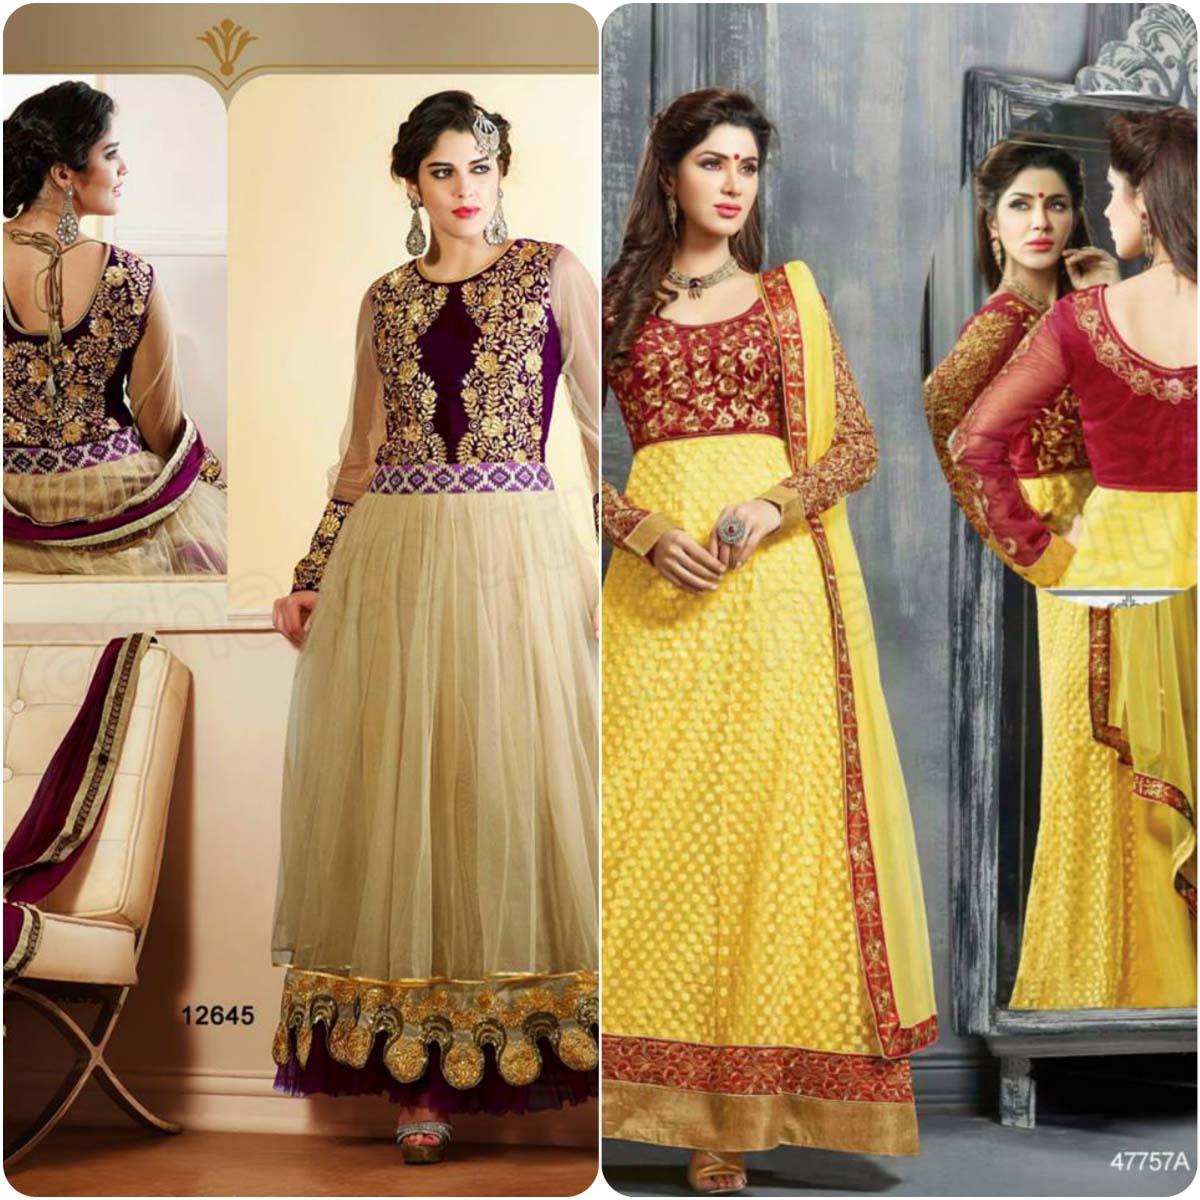 Natasha Couture Latest Indian Anarkali Dress Desigs Collection 2016-2017...styloplanet (10)